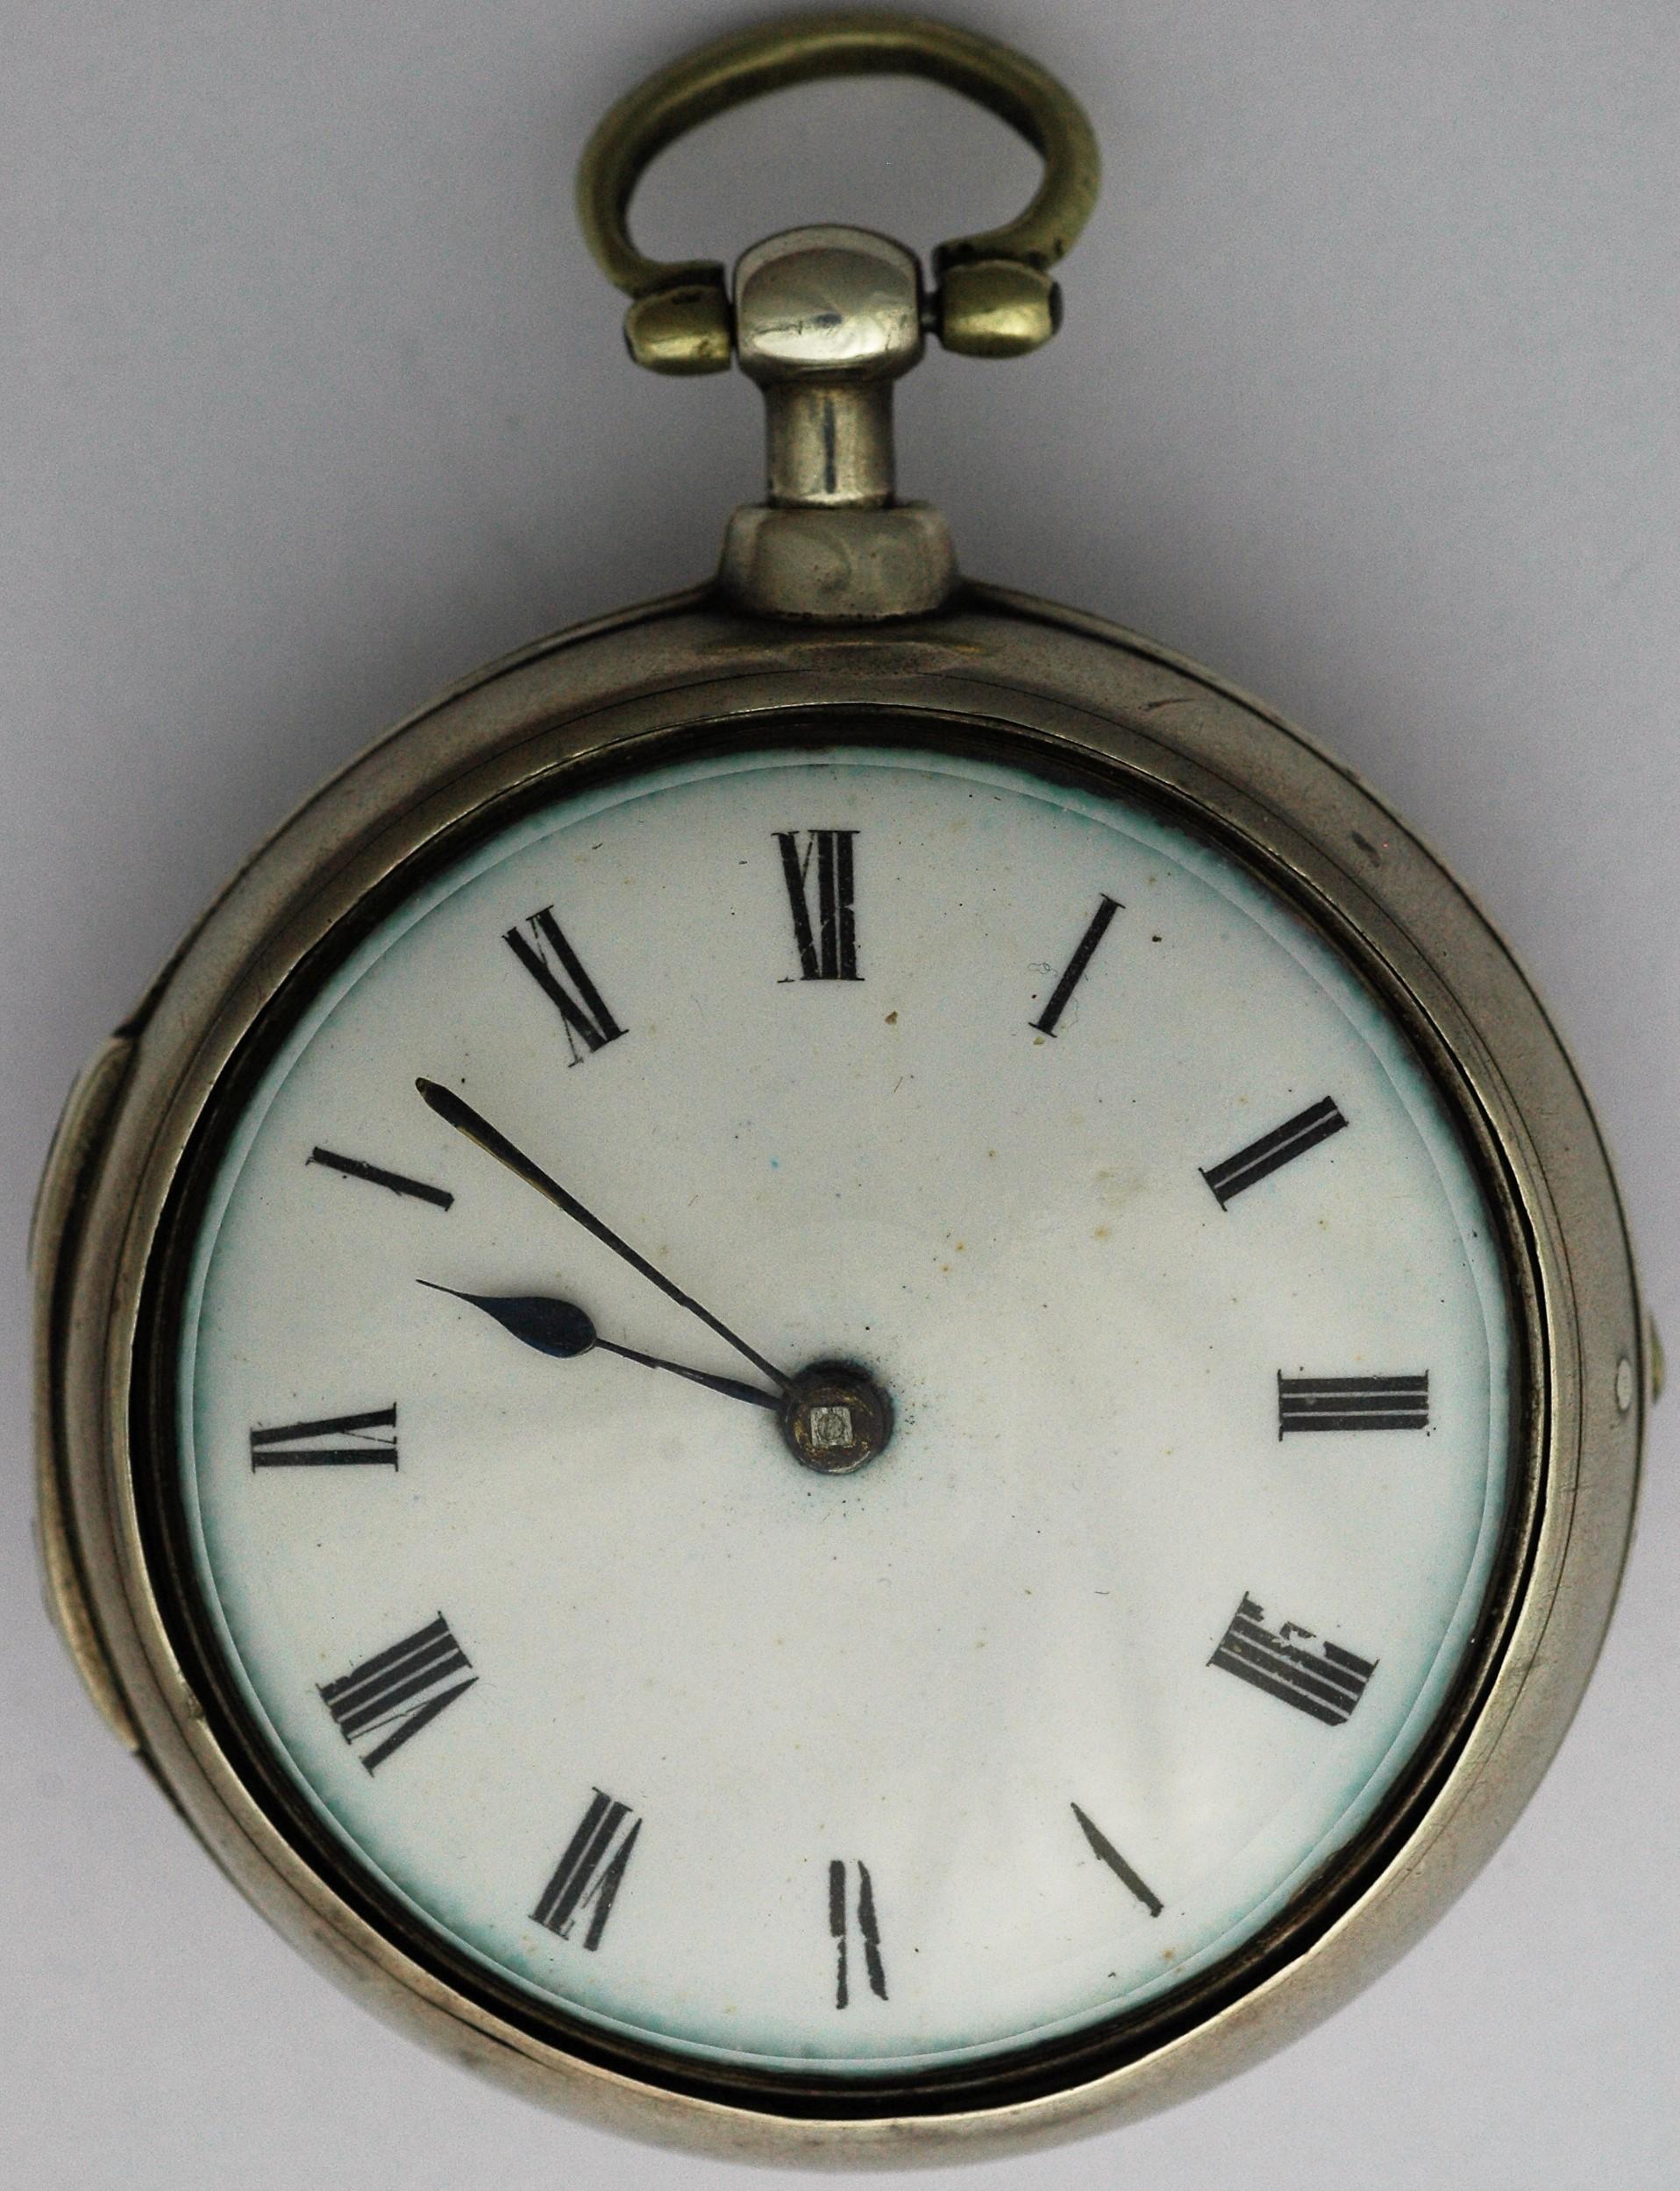 fazarkerley-henry-144-dial